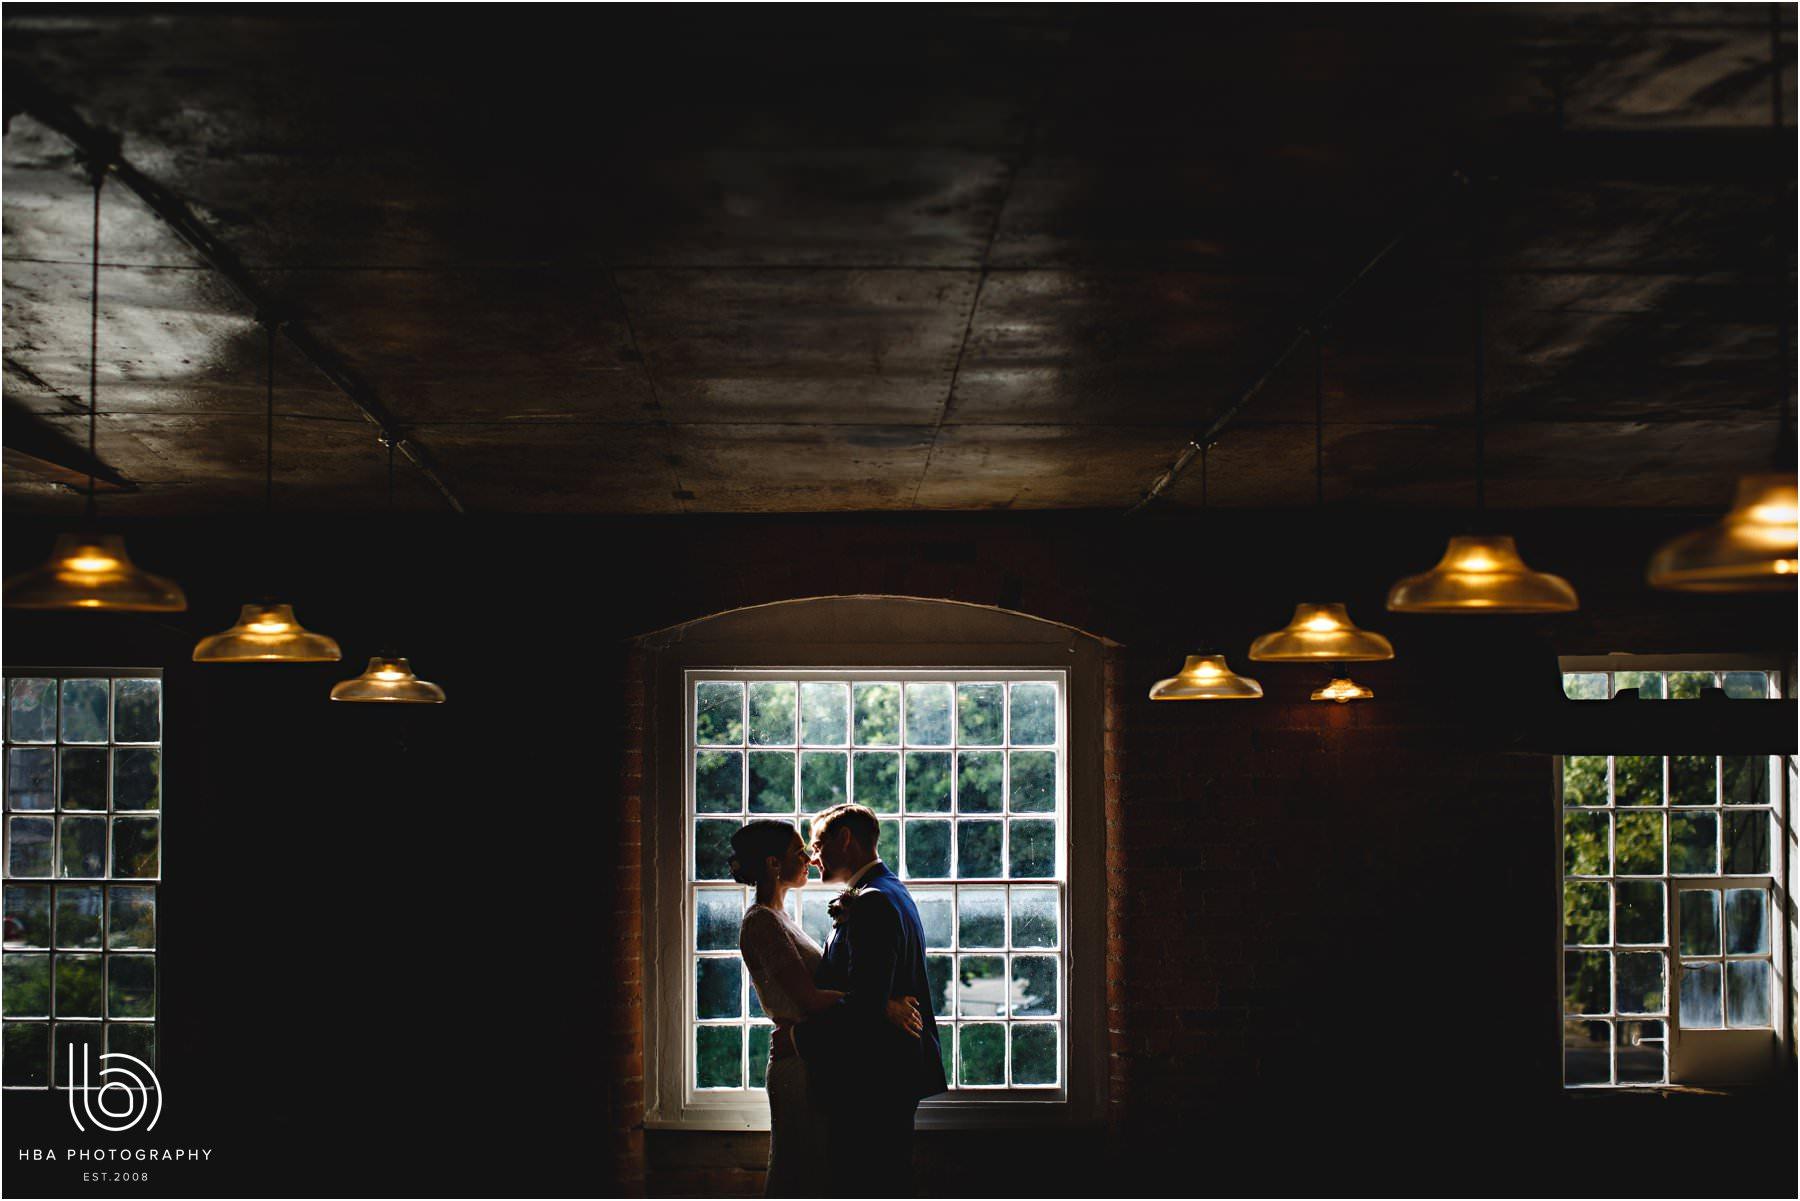 the bride & groom inside